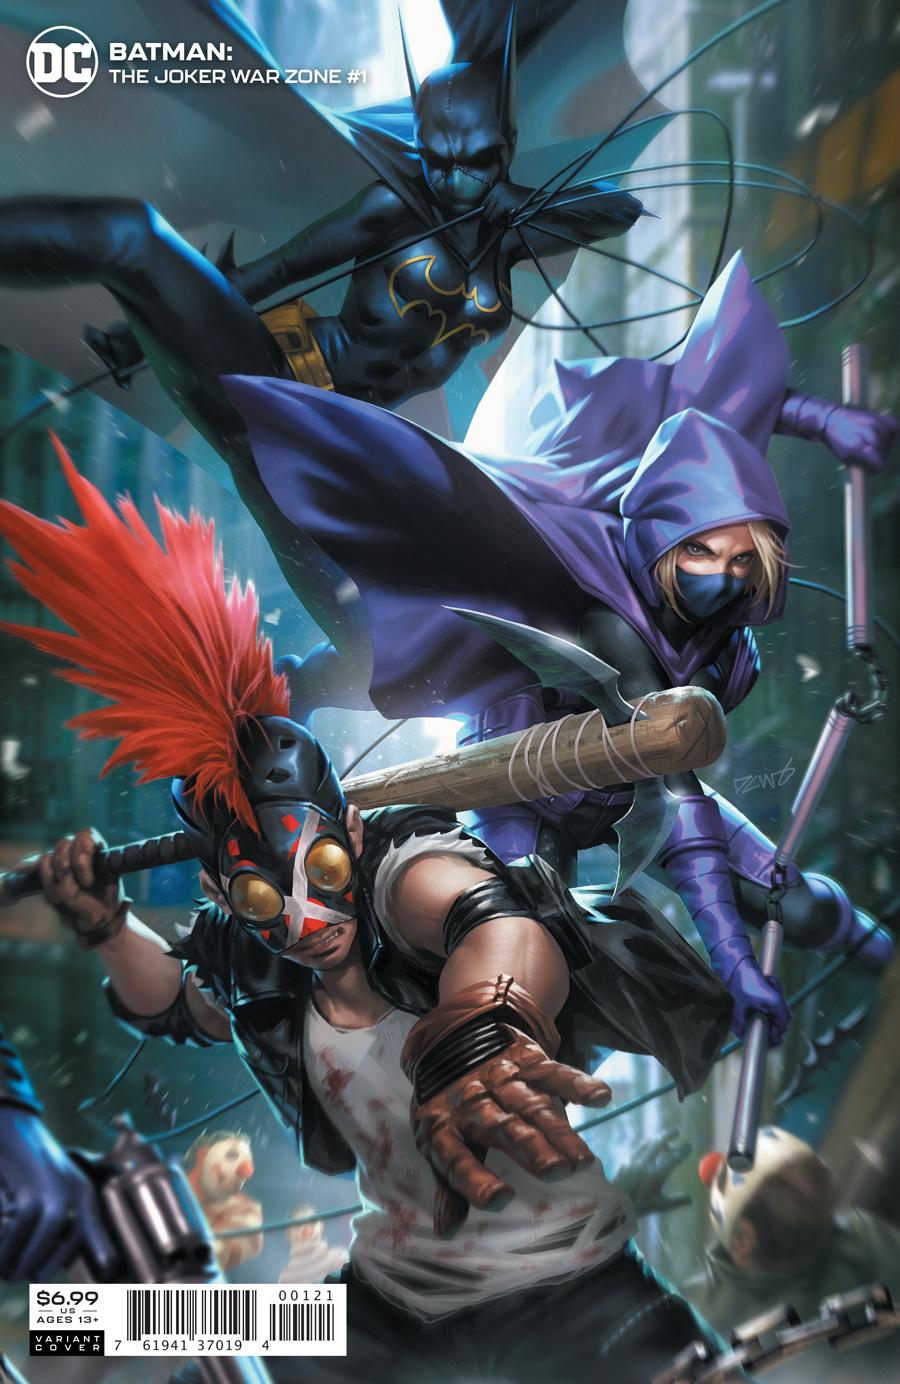 Batman Vol 3 Joker War Zone #1 Cover B Derrick Chew Variant